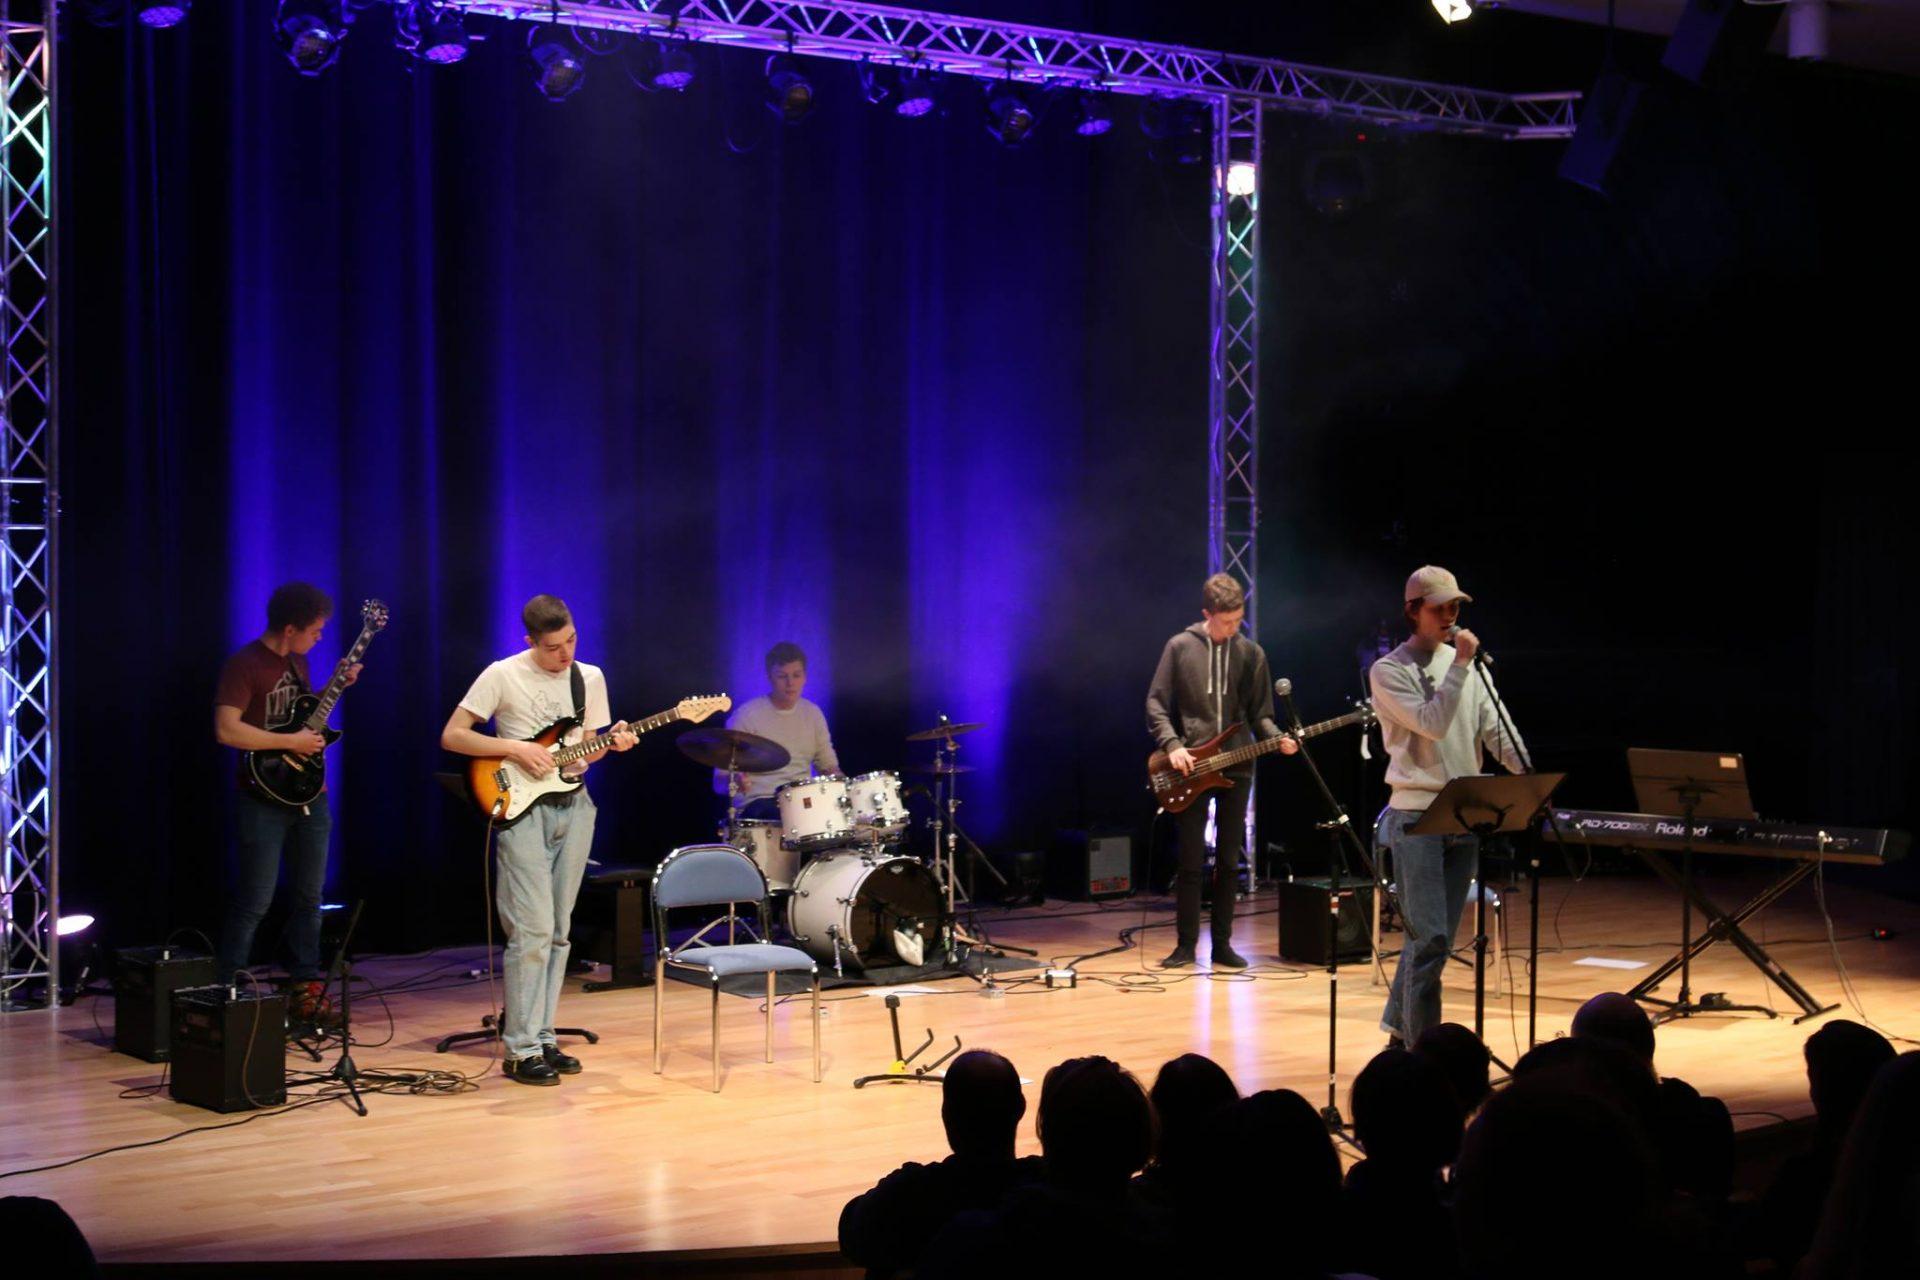 Bandkonsert med Knuden Kulturskole